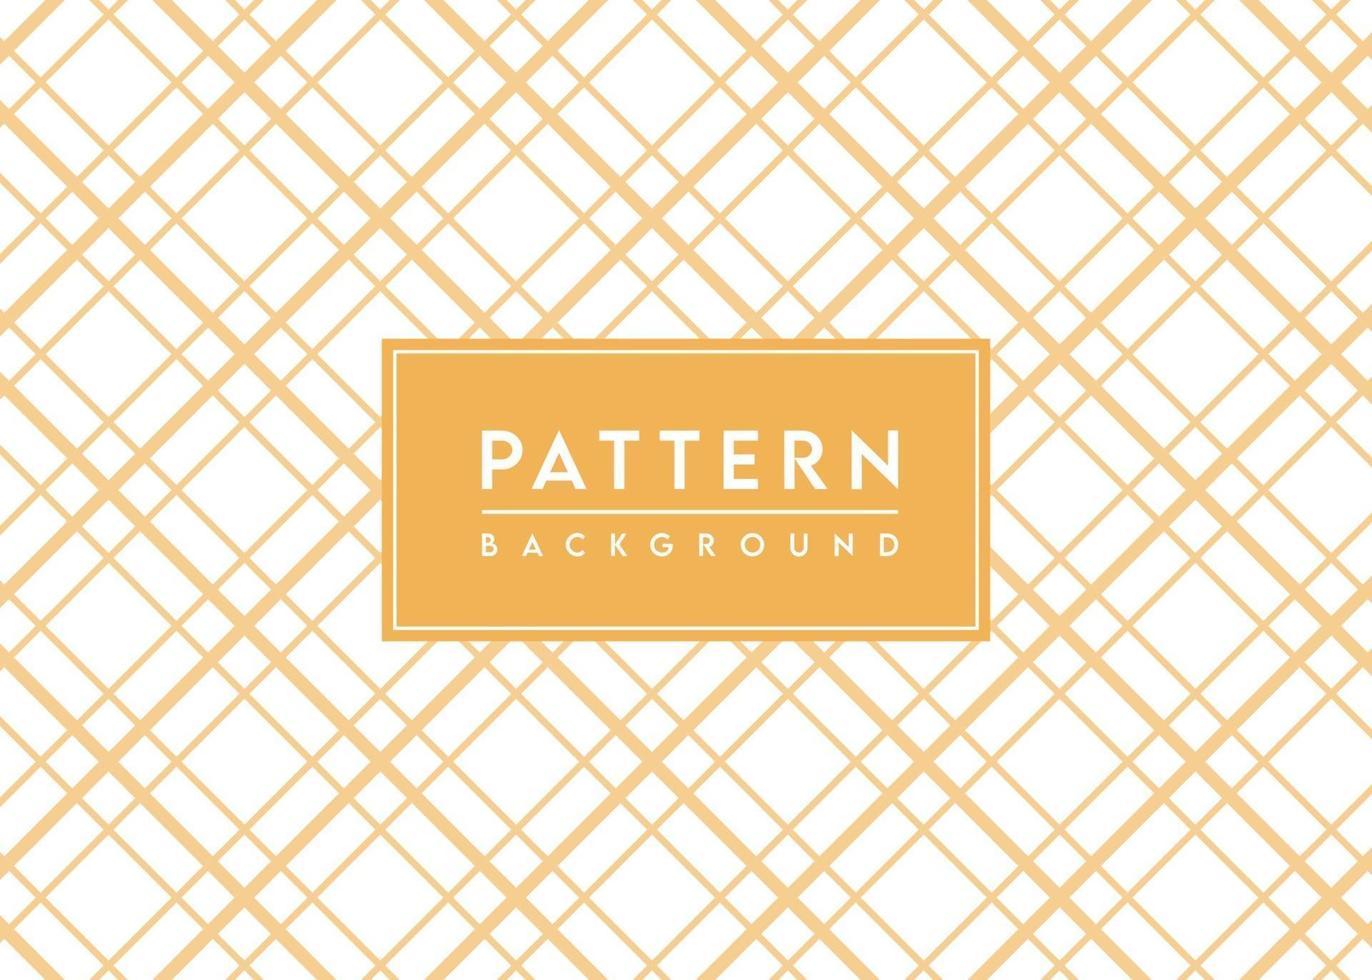 Crossed Line Pattern Background Textured Vector Design